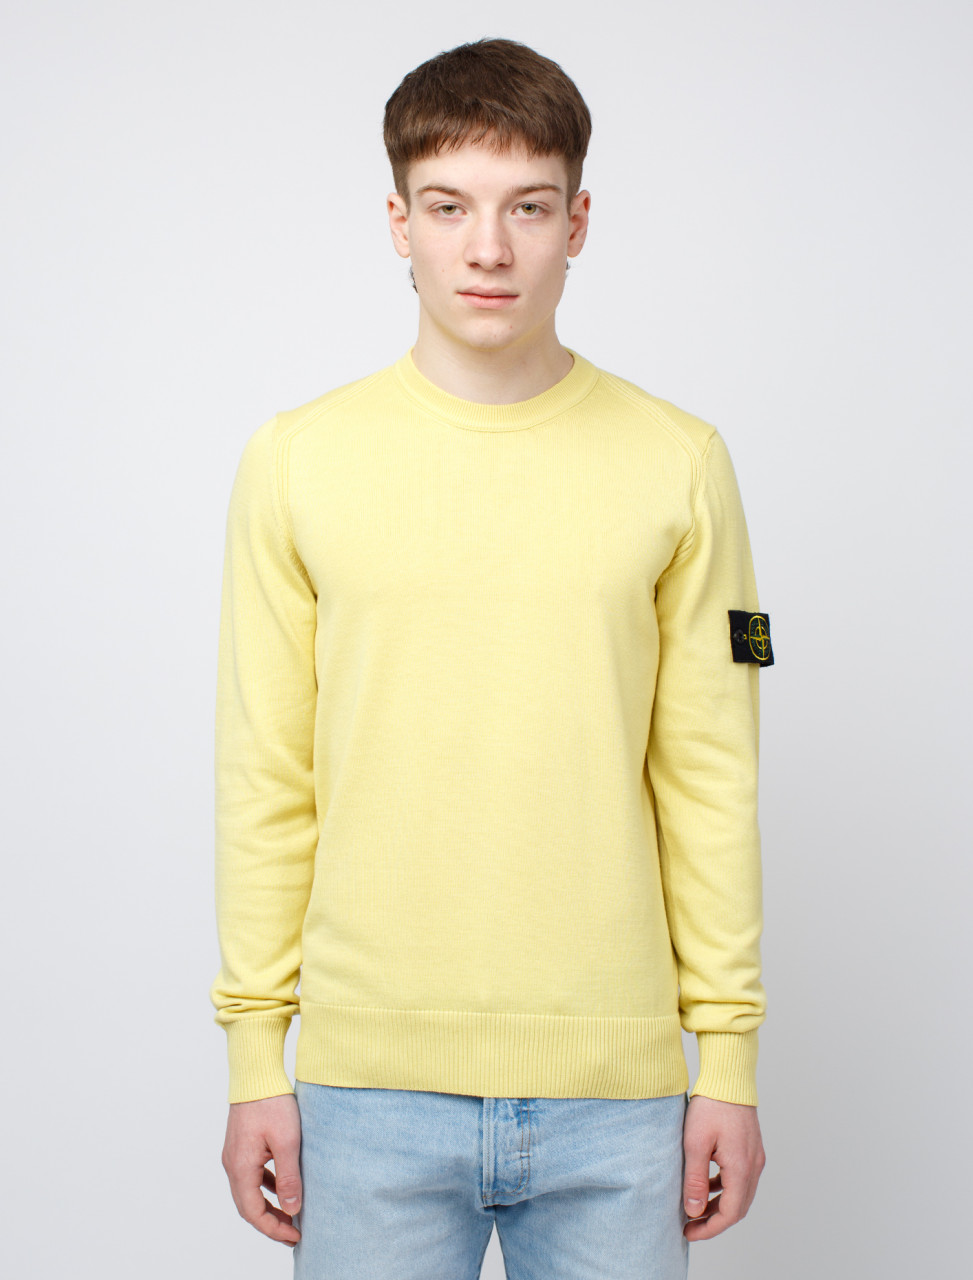 SI Lemon Cotton Knit Sweatshirt